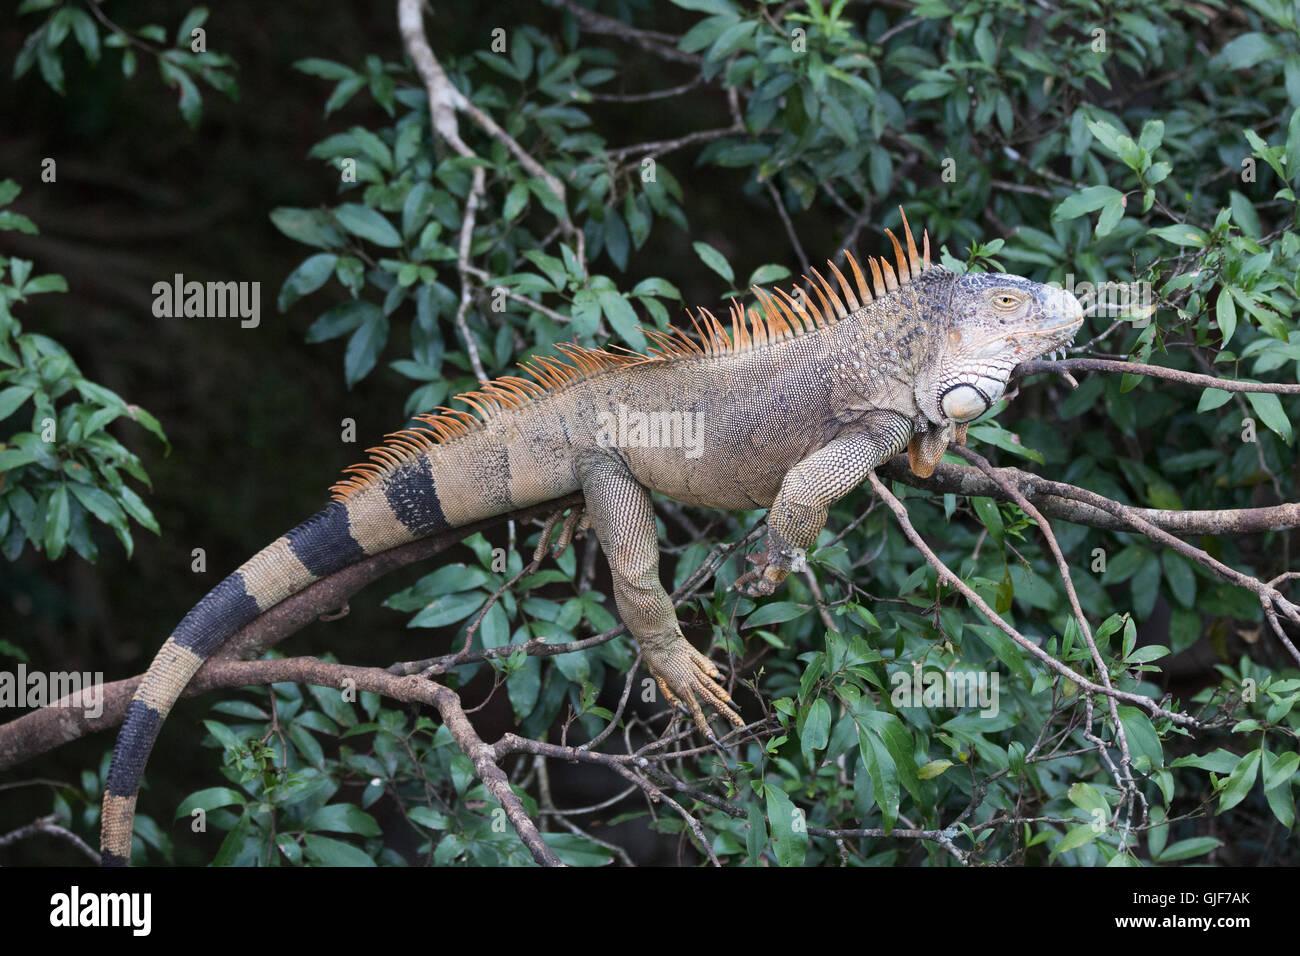 Comunes o iguana verde (Iguana iguana) en el bosque lluvioso, el ...